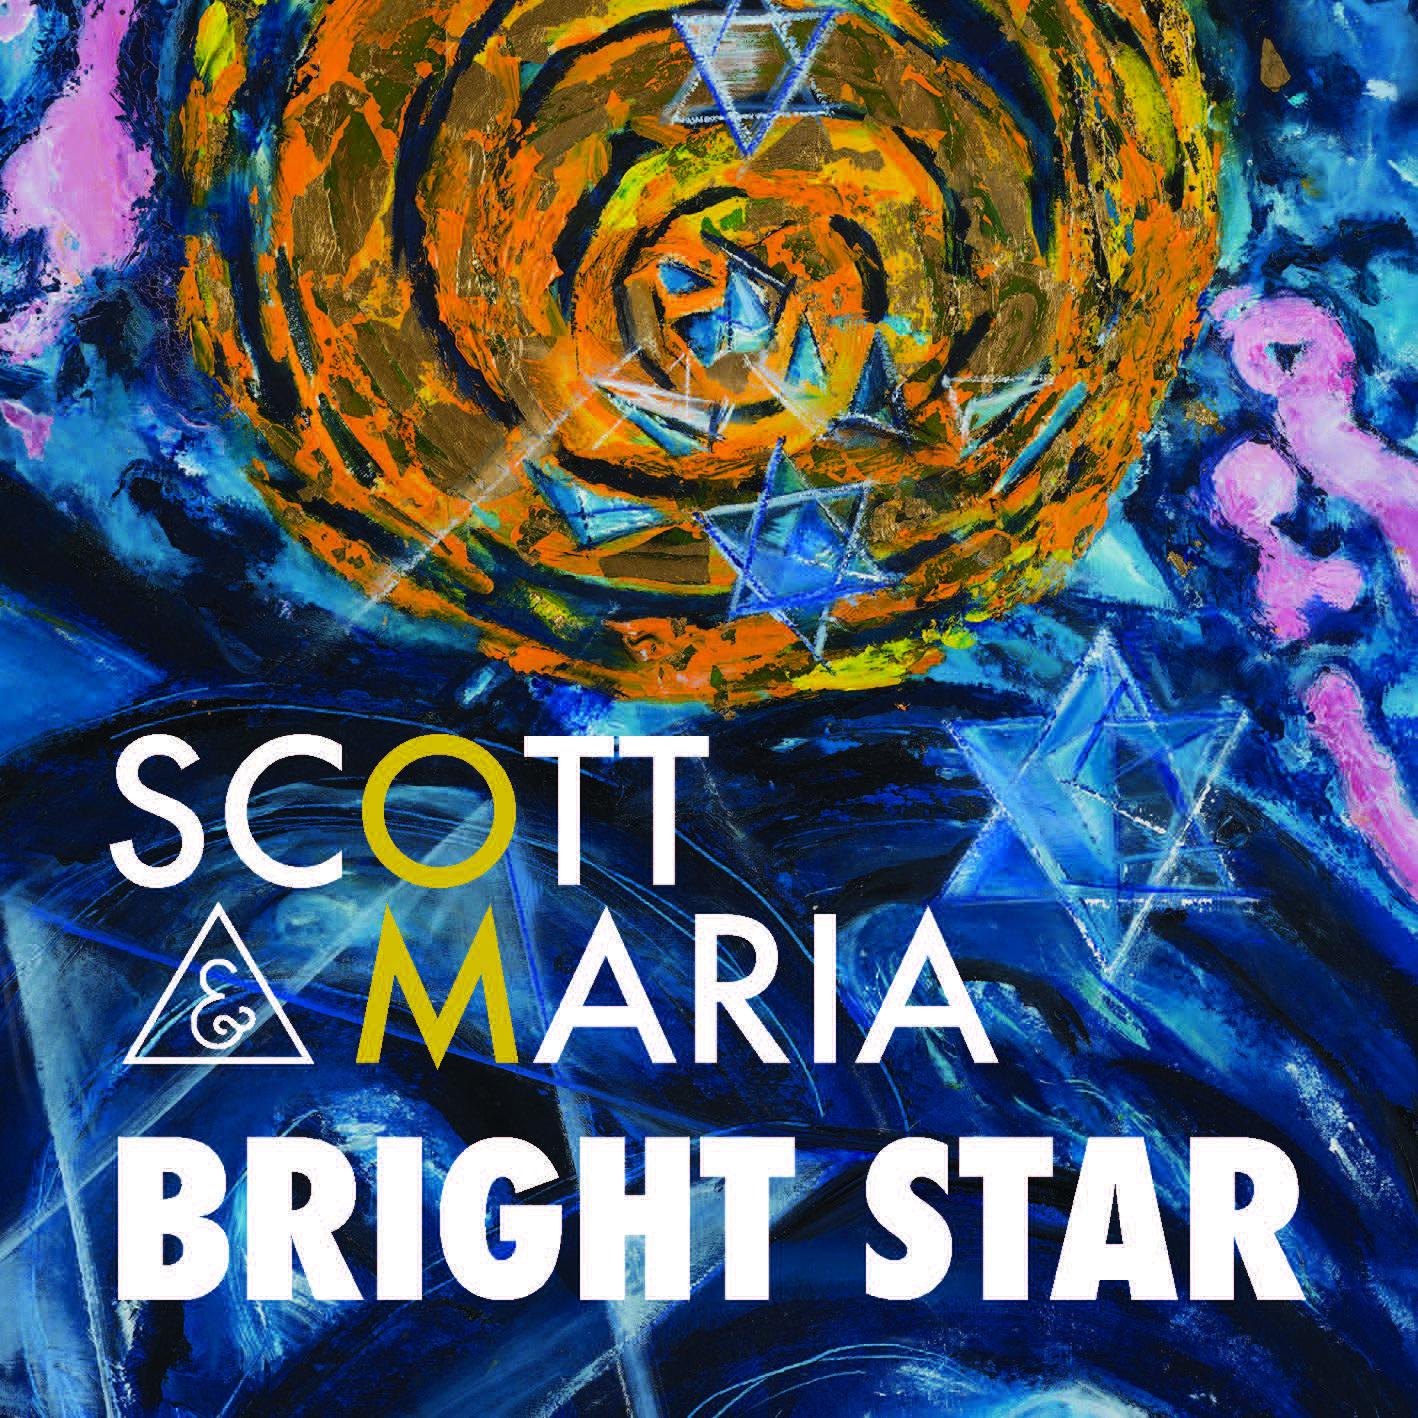 BRIGHT_STAR_ALBUM_by_Scott_and_Maria